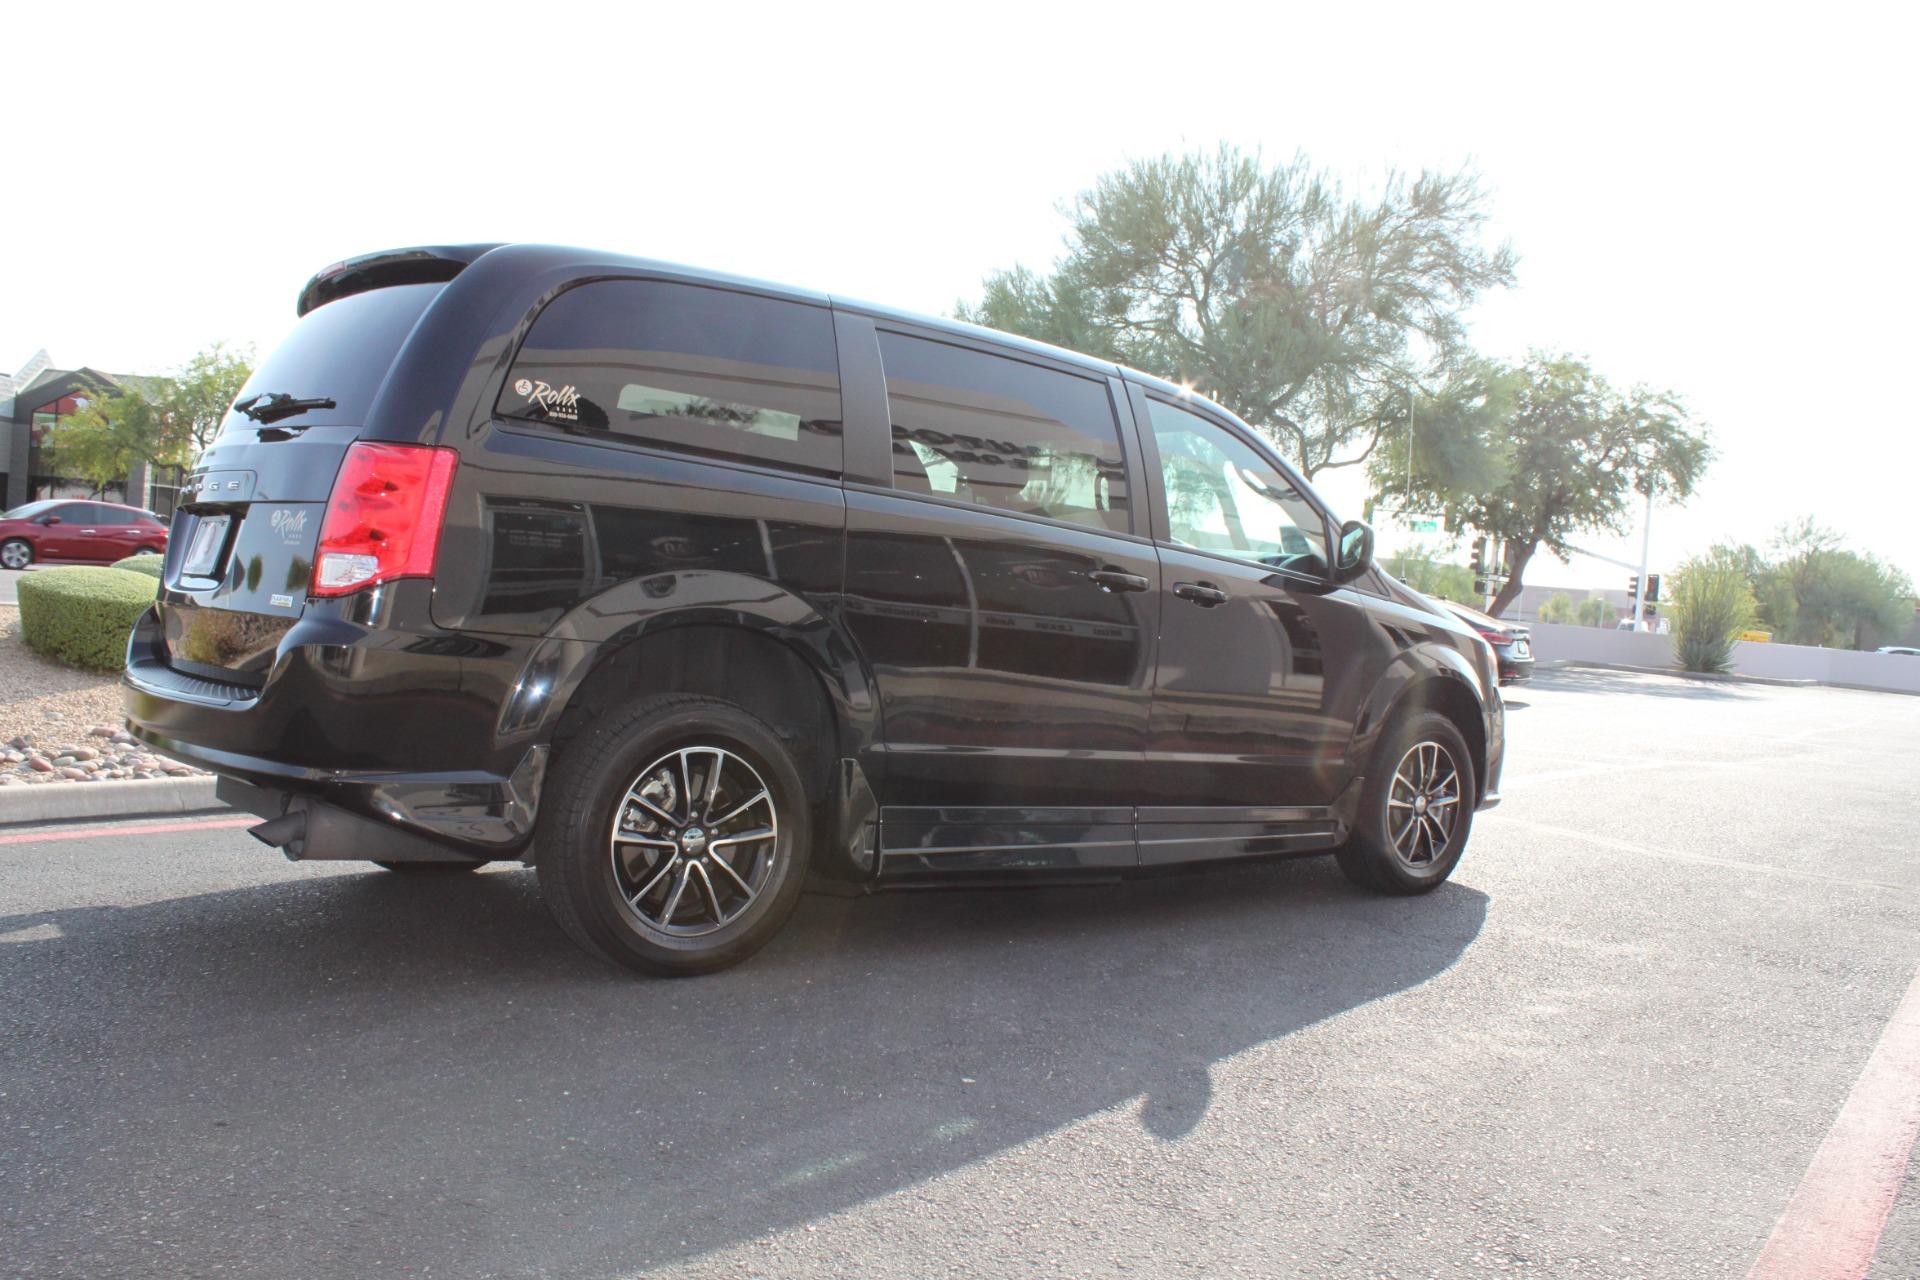 Used-2018-Dodge-Grand-Caravan-SXT-Rollx-Mobility-Conversion-Dodge